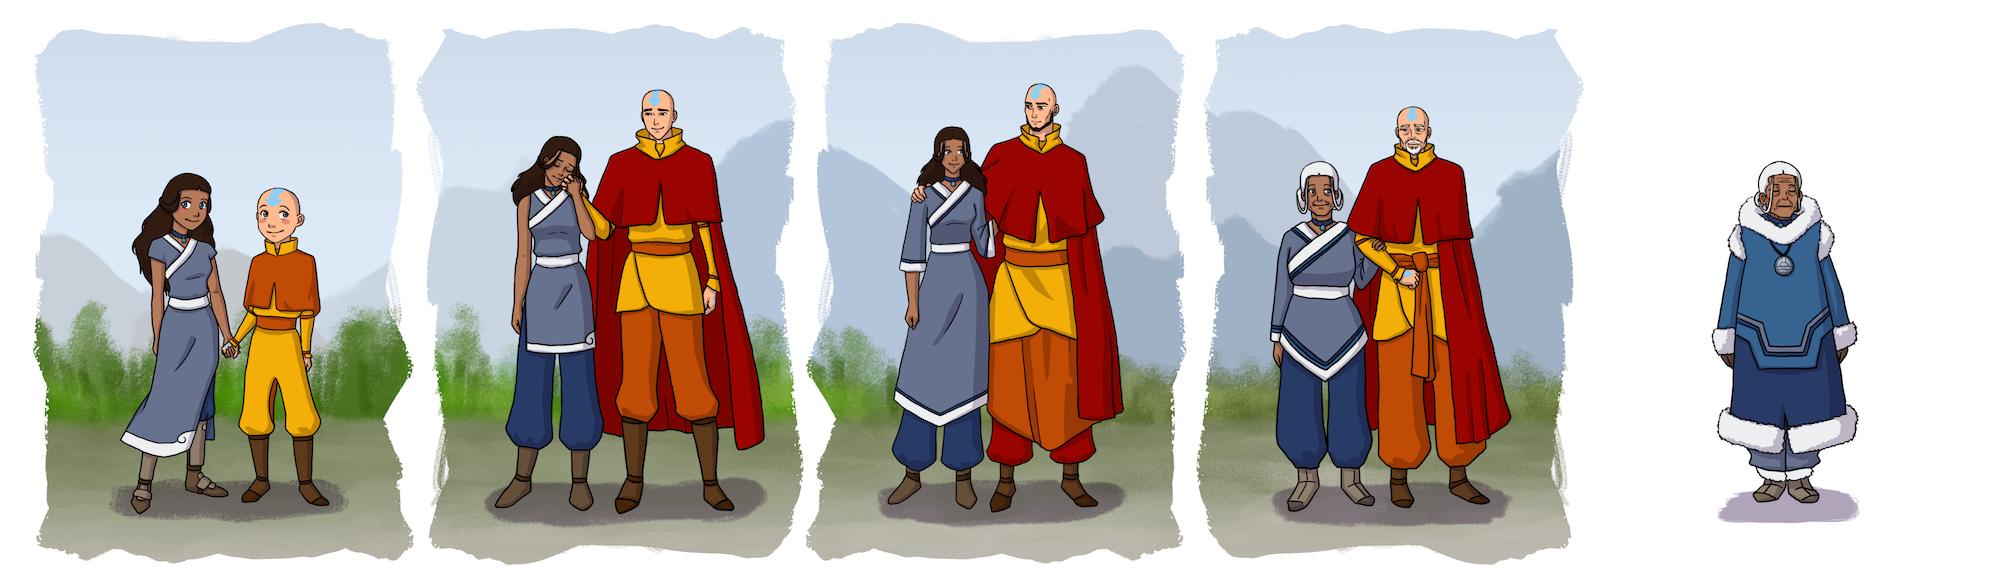 Aang Korra aang and katara - avatar: the legend of korra photo